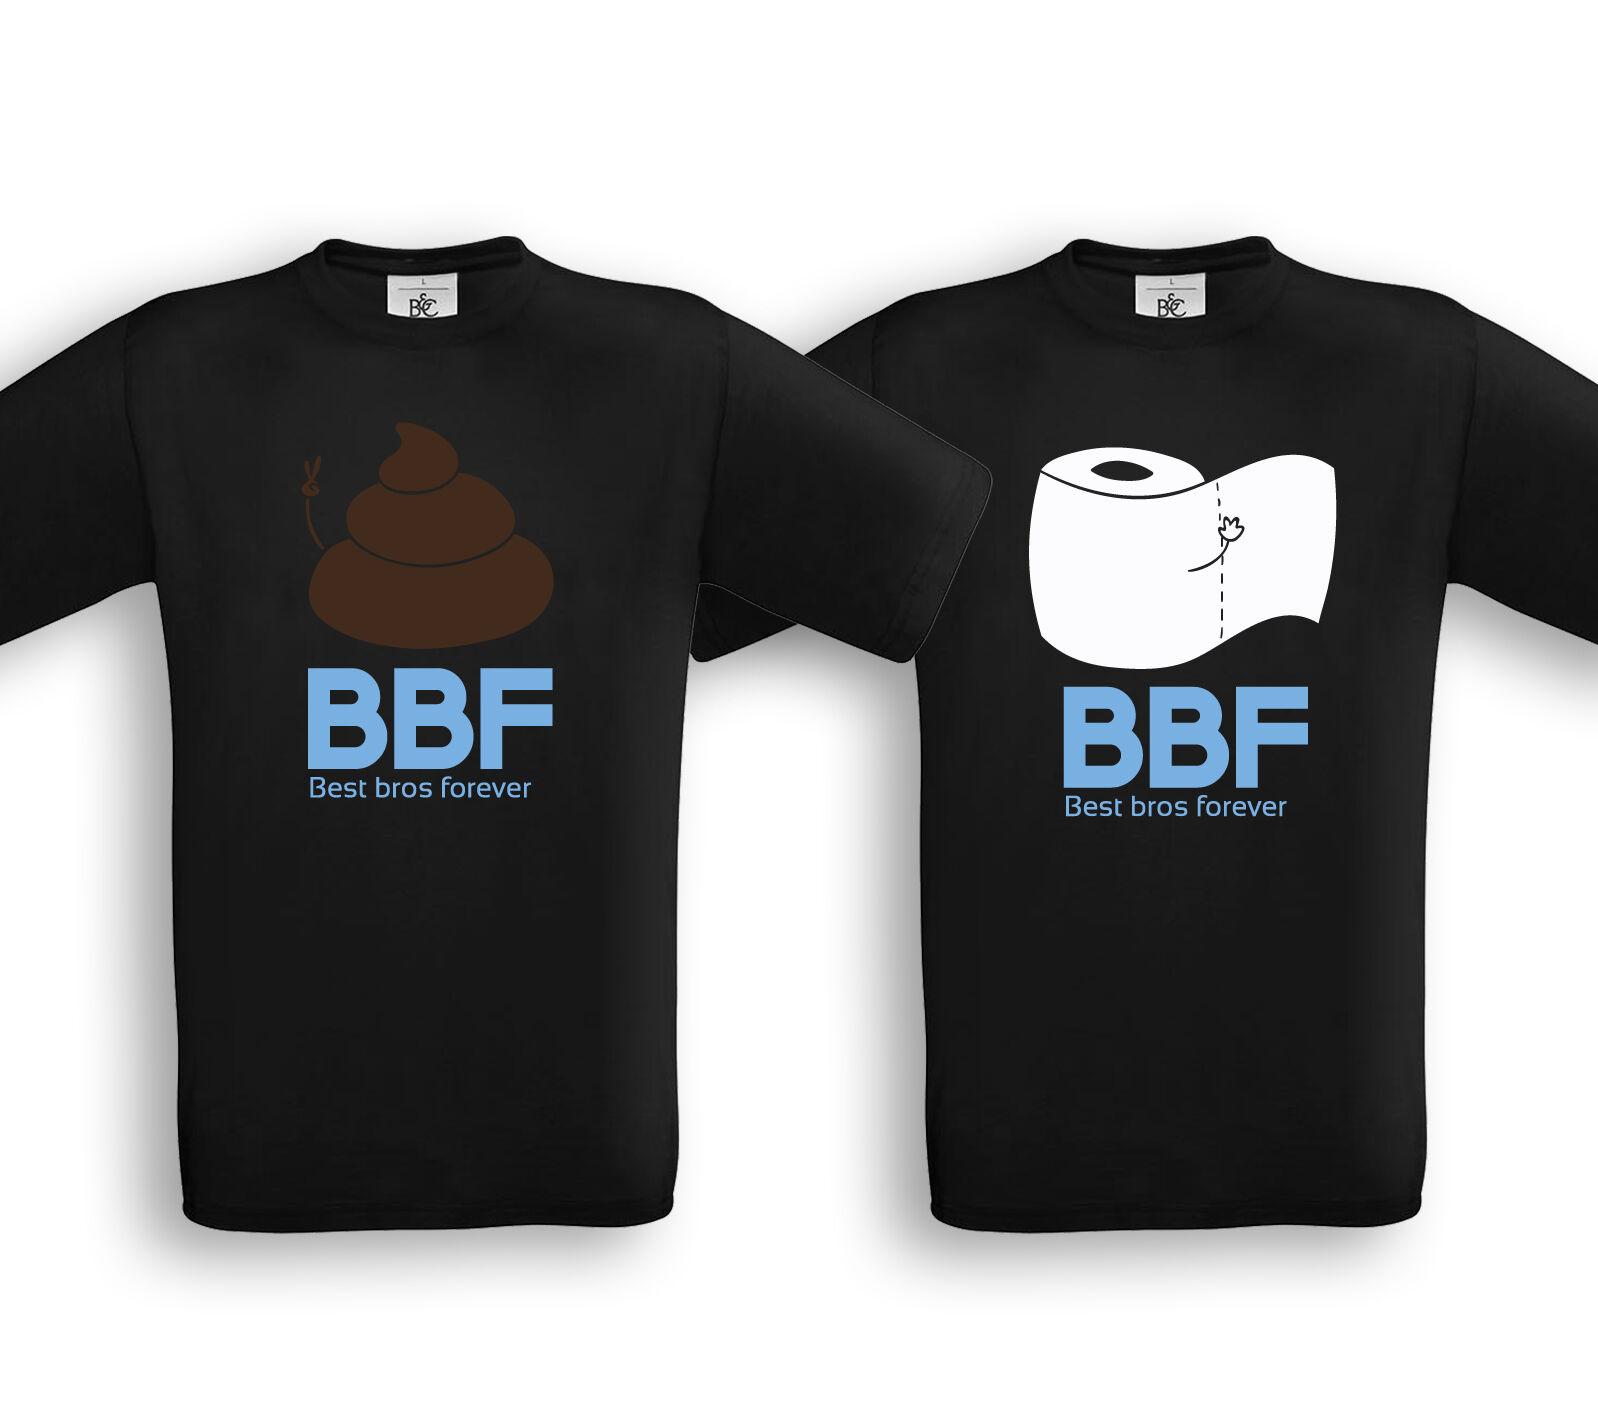 BEST BROS FOREVER - Partner Shirts - Friends Brüder Bros Geschwister Geschenk  | Großartig  | Modisch  | Trendy